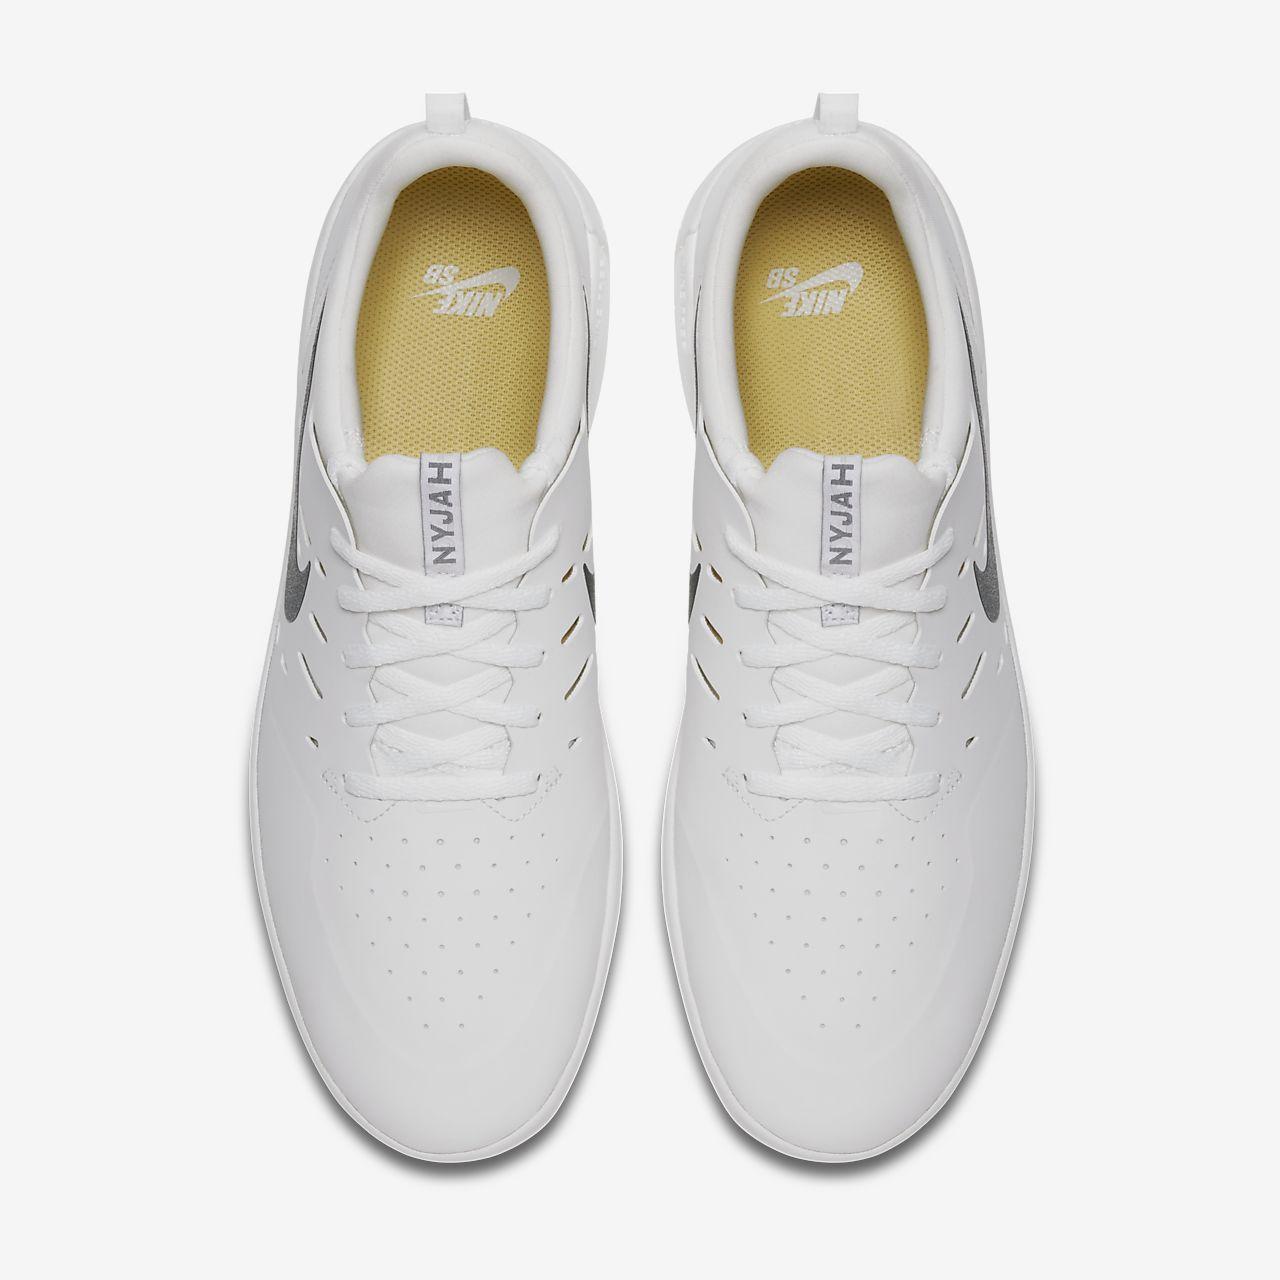 new product 9c839 7ade9 ... Skateboardsko Nike SB Nyjah Free